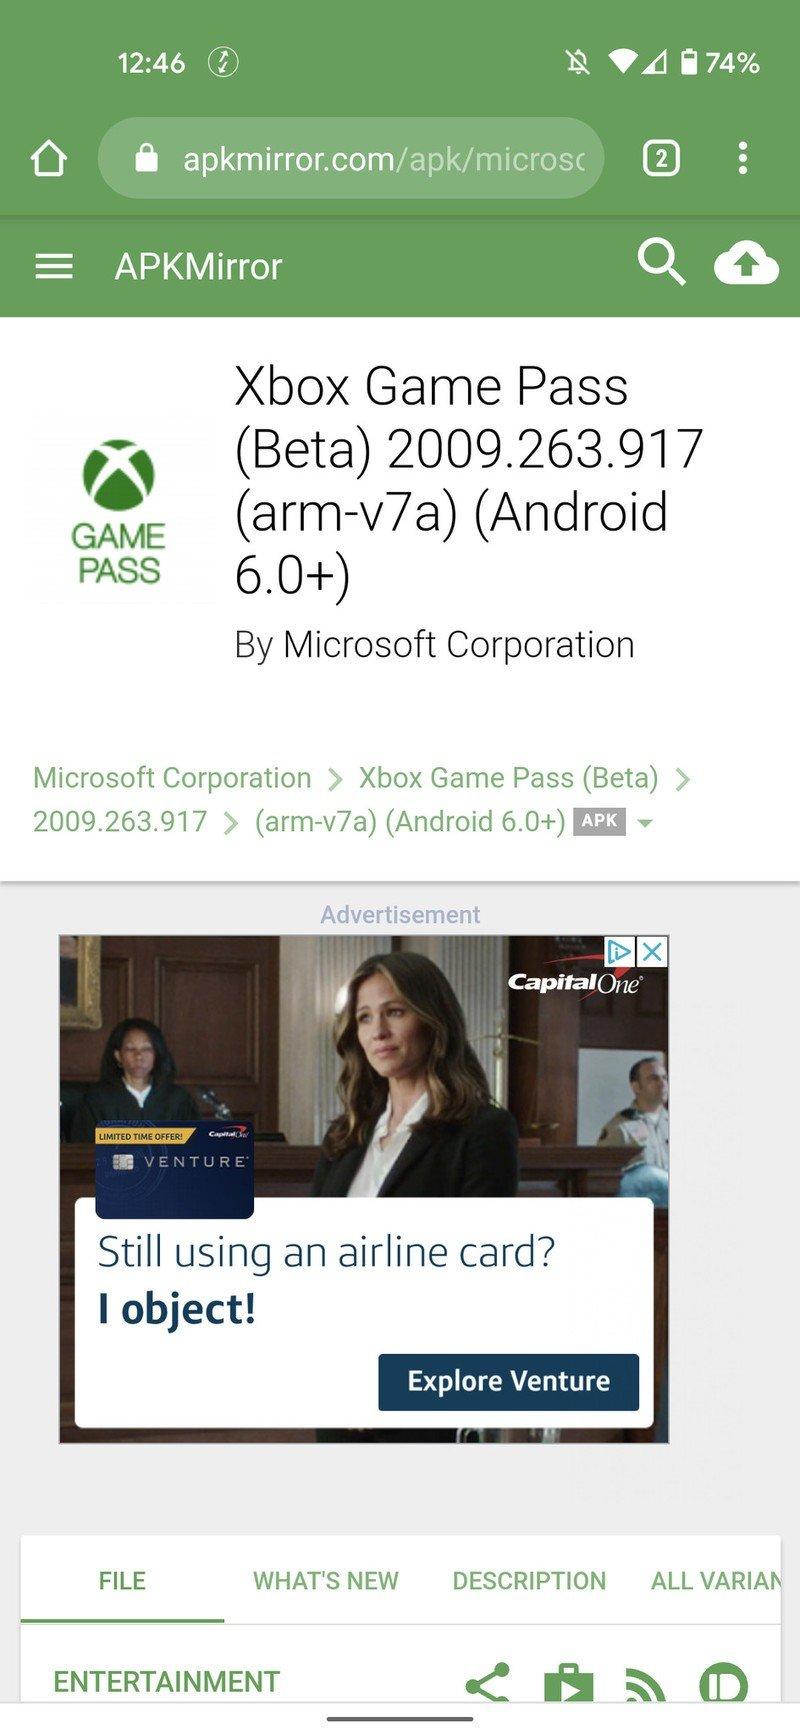 xbox-game-pass-android-tv-phone-1.jpg